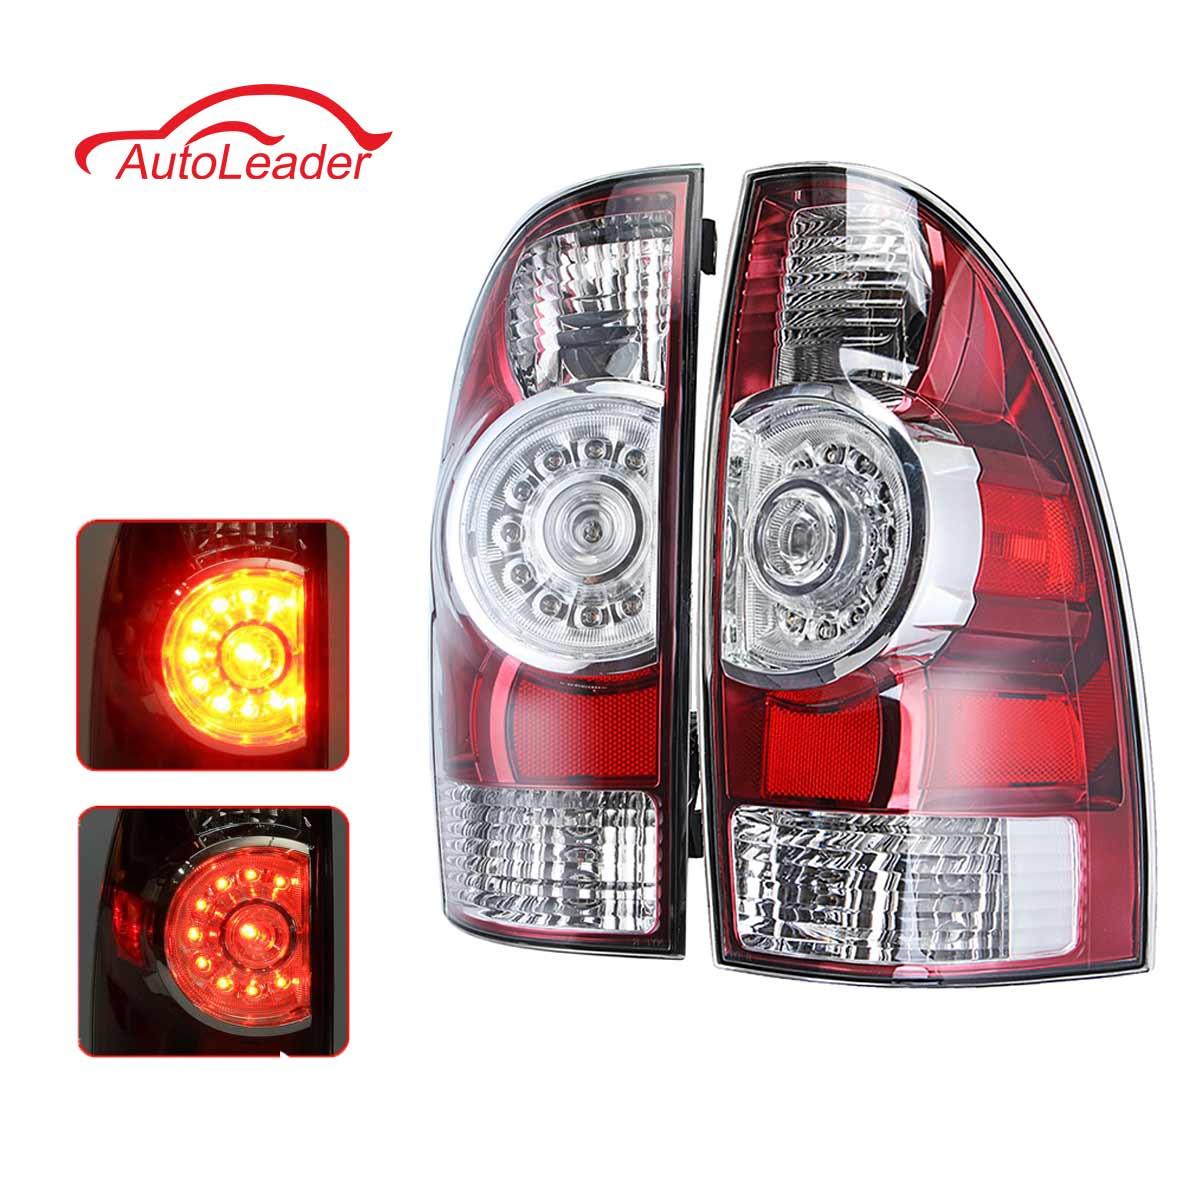 Car Rear LED Tail Light Brake Lamp Left/ Right for Toyota Tacoma Pickup 2005 2006 2007 2008 2009 2010-2015 8156004160 8155004150